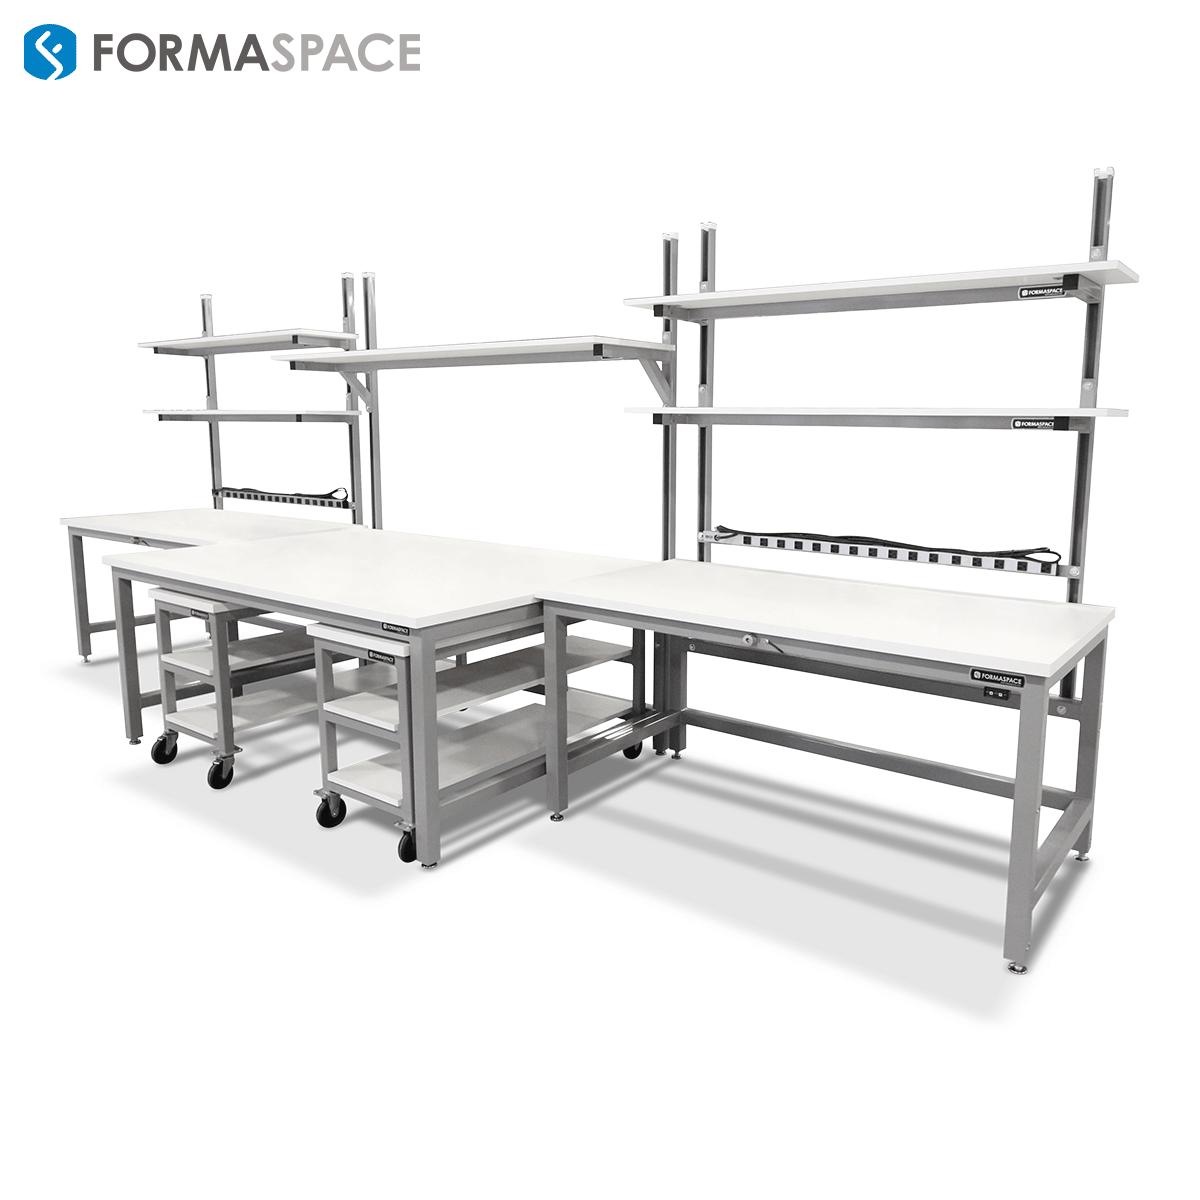 formaspace laboratory workbenches